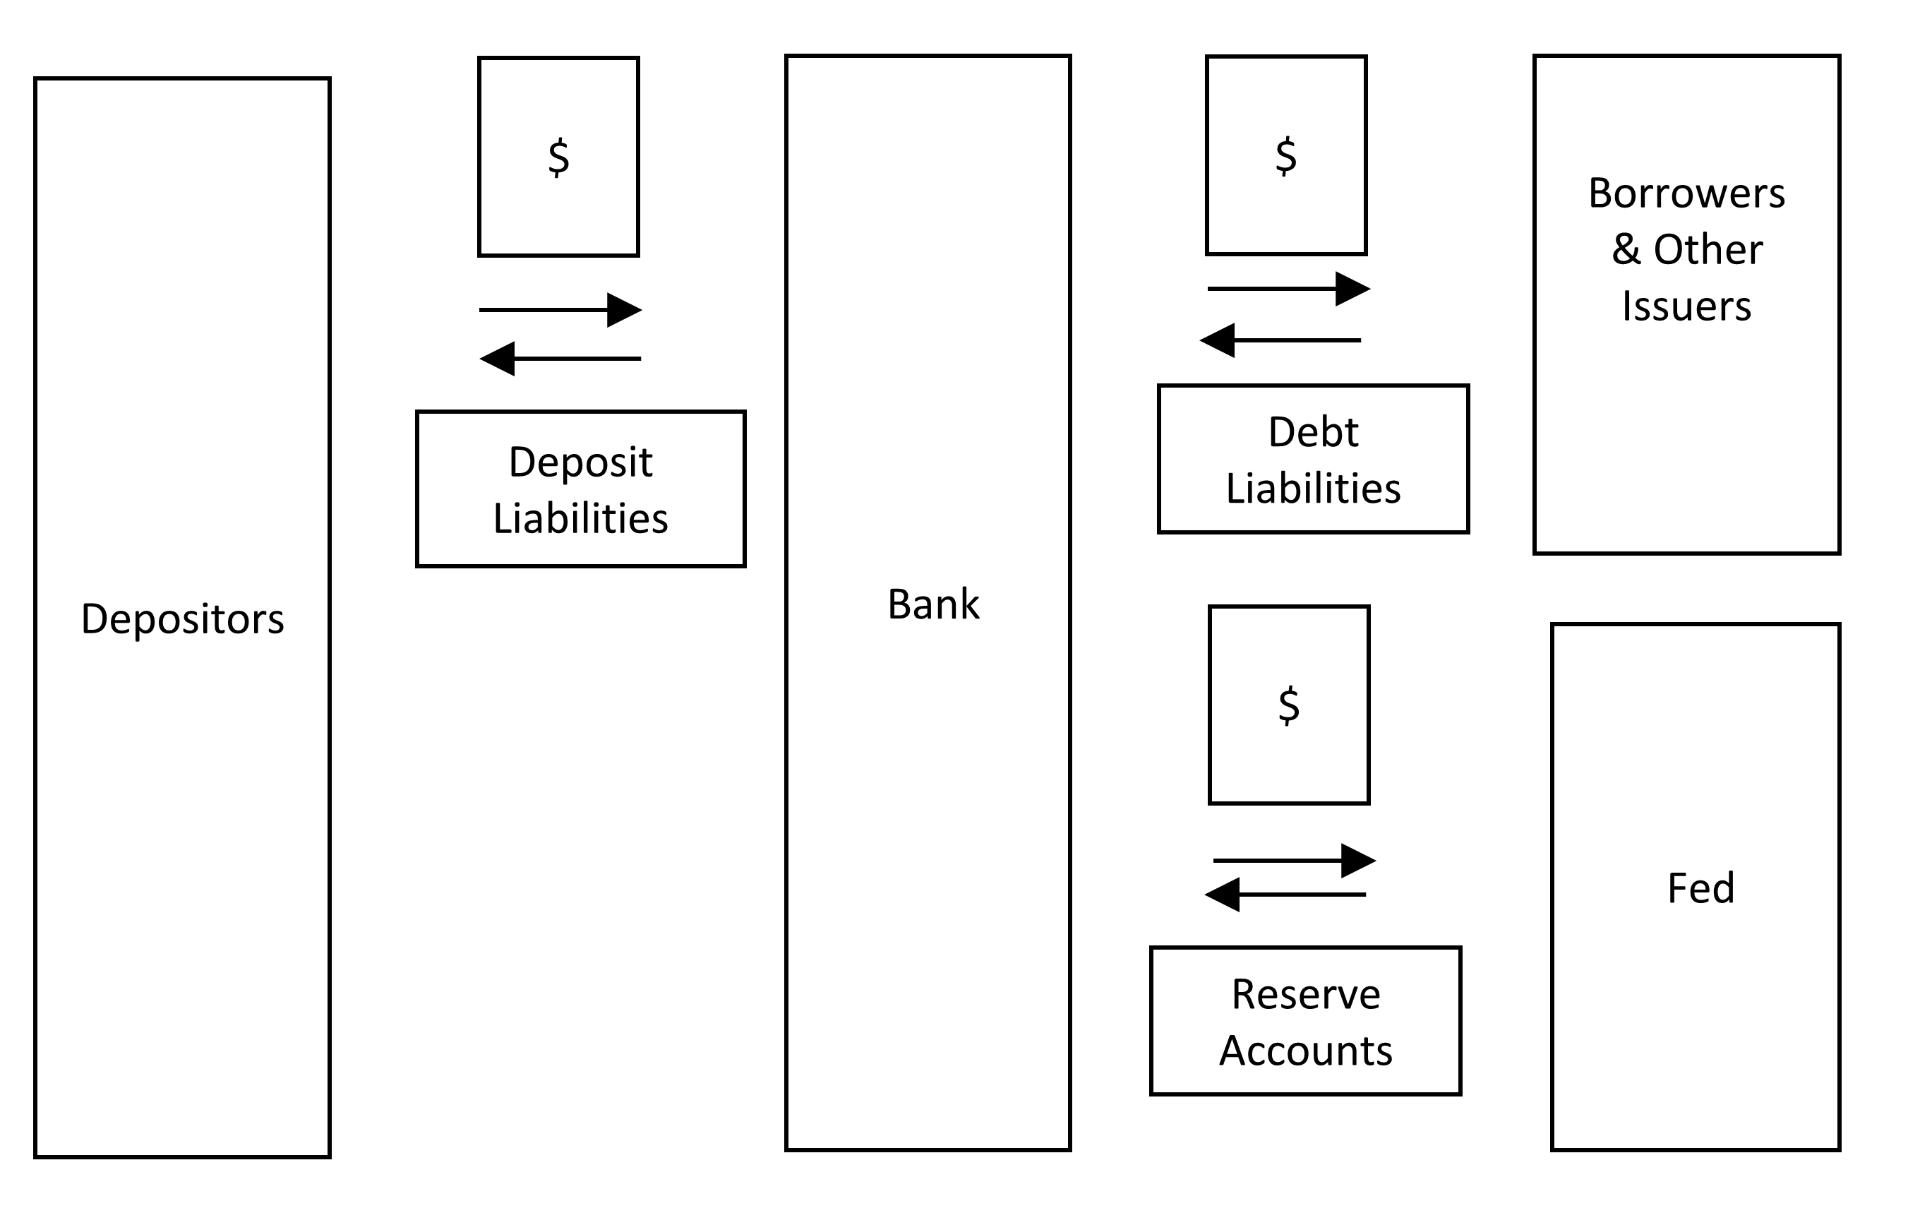 Current Fed/Bank/Depositor/Issuer Arrangements & Financial Flows